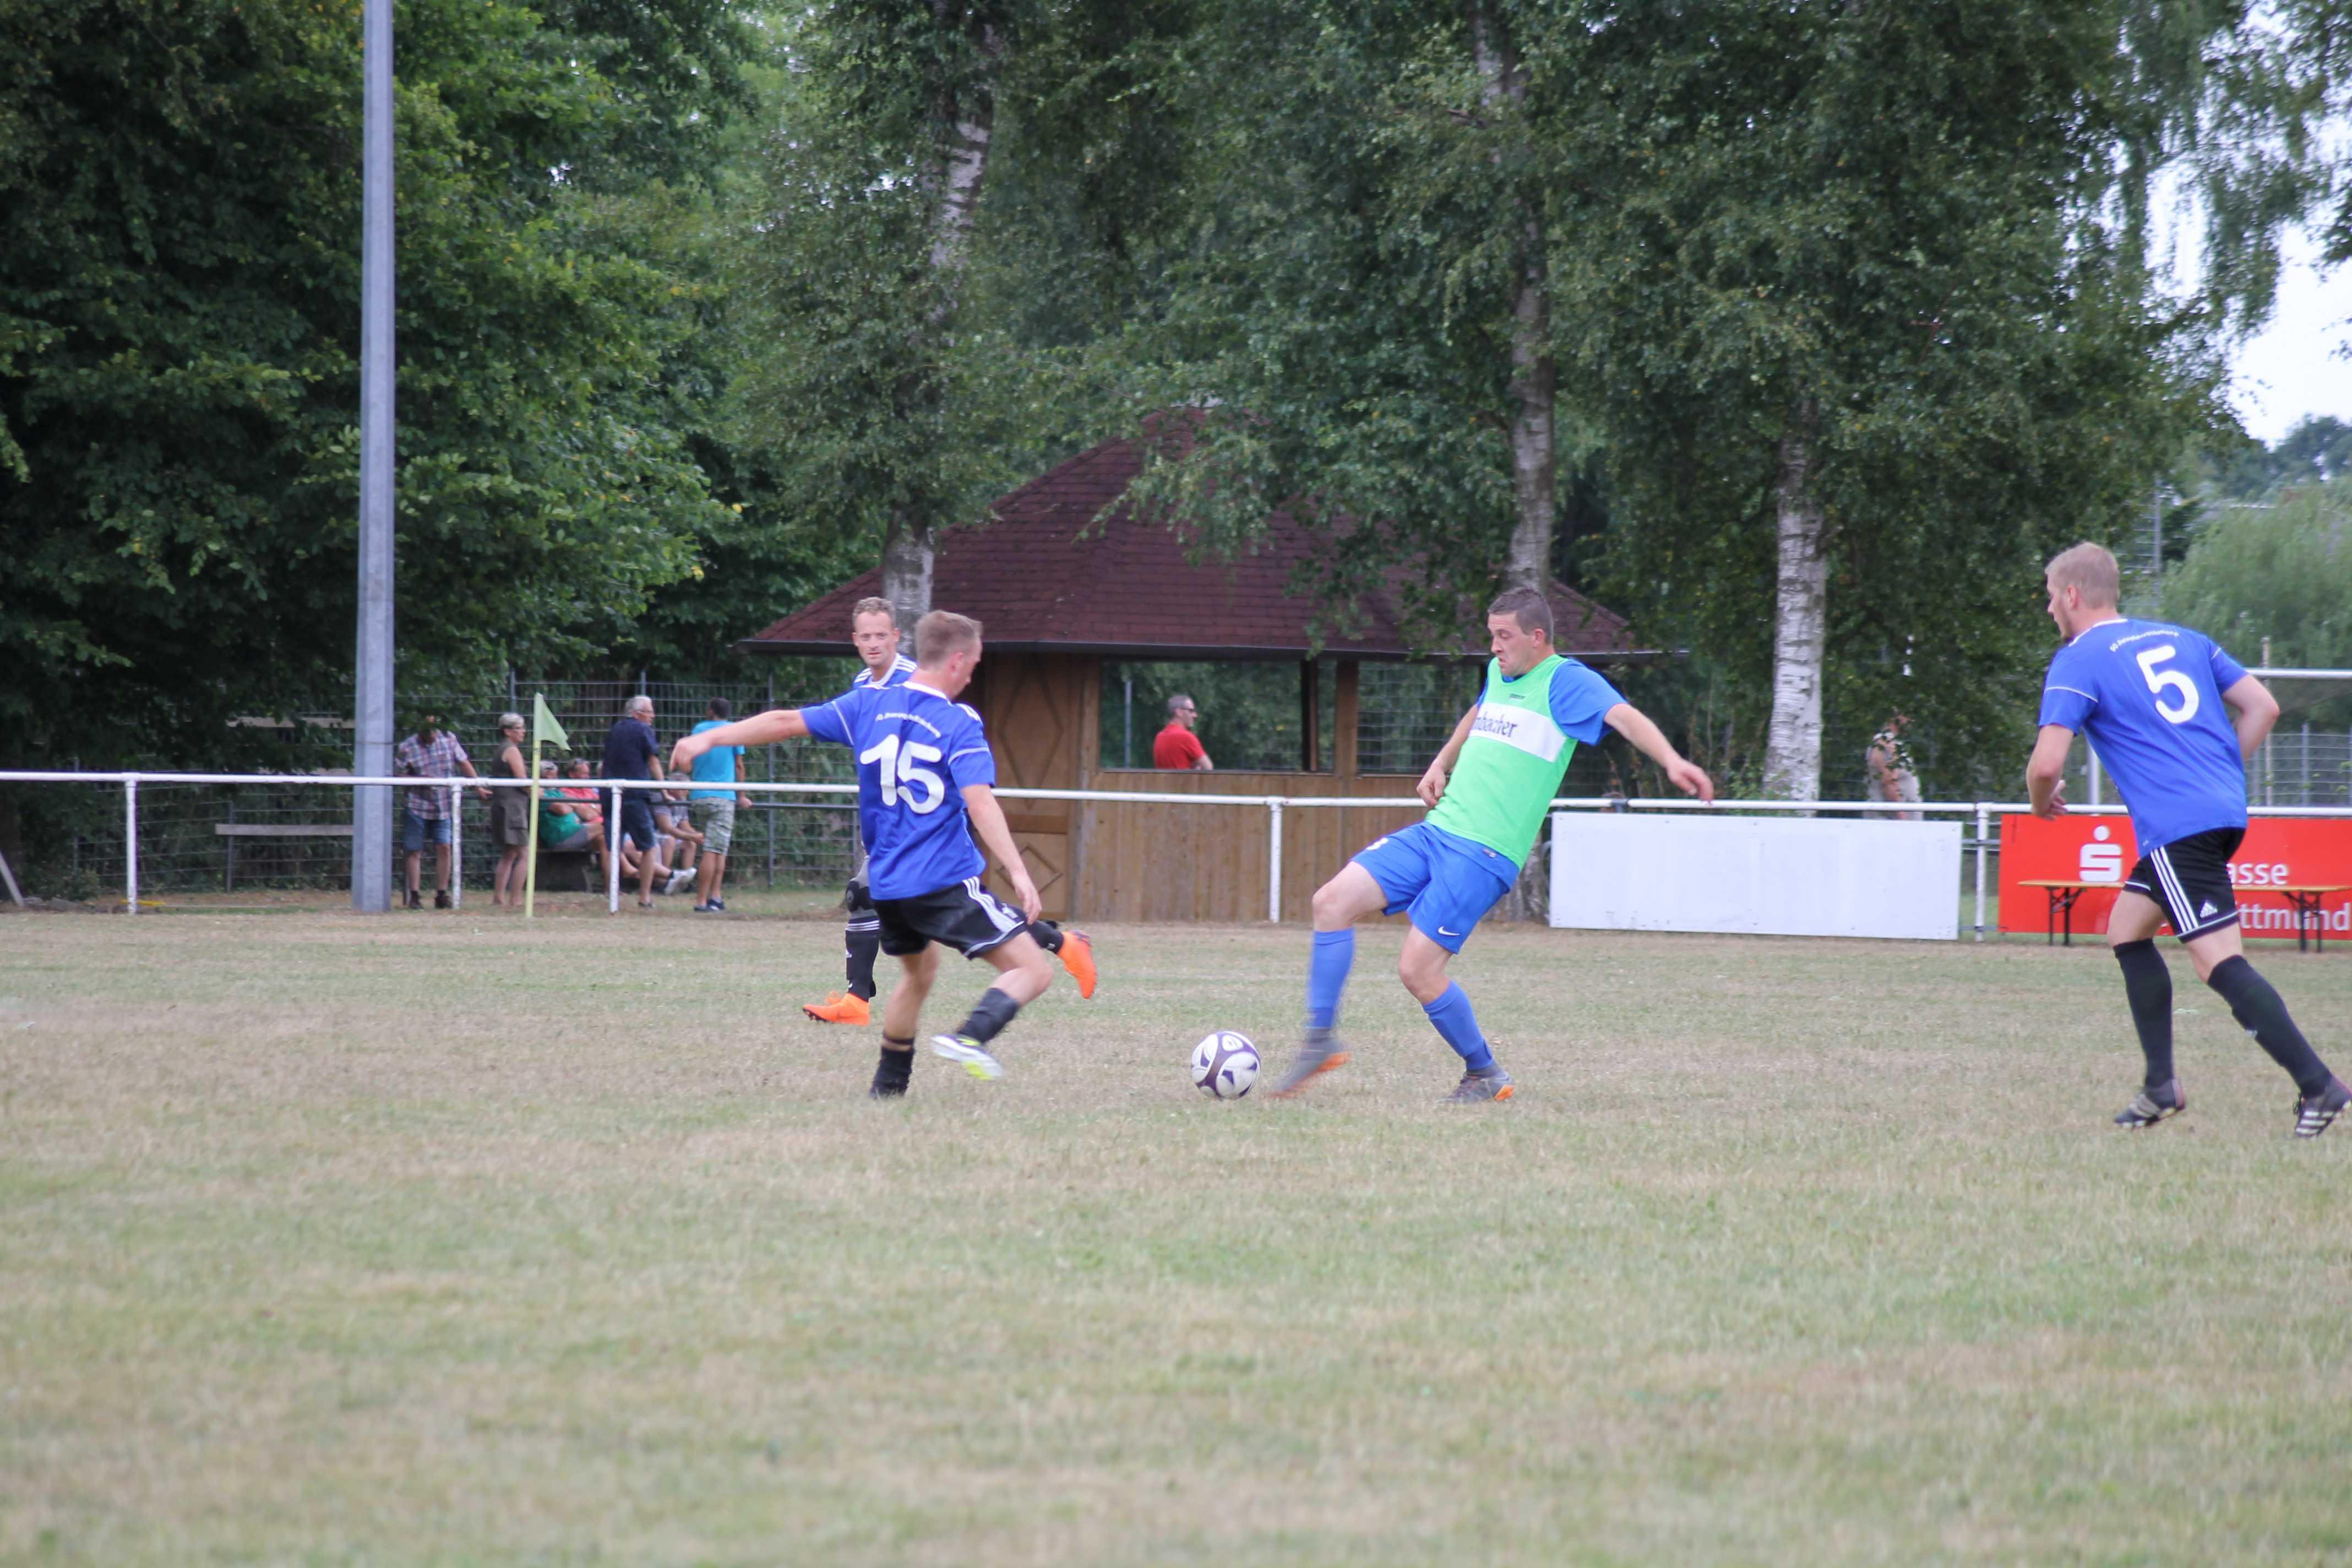 2018-07-29 Sportwoche - Sportpicknick & Football & Fußball (110)